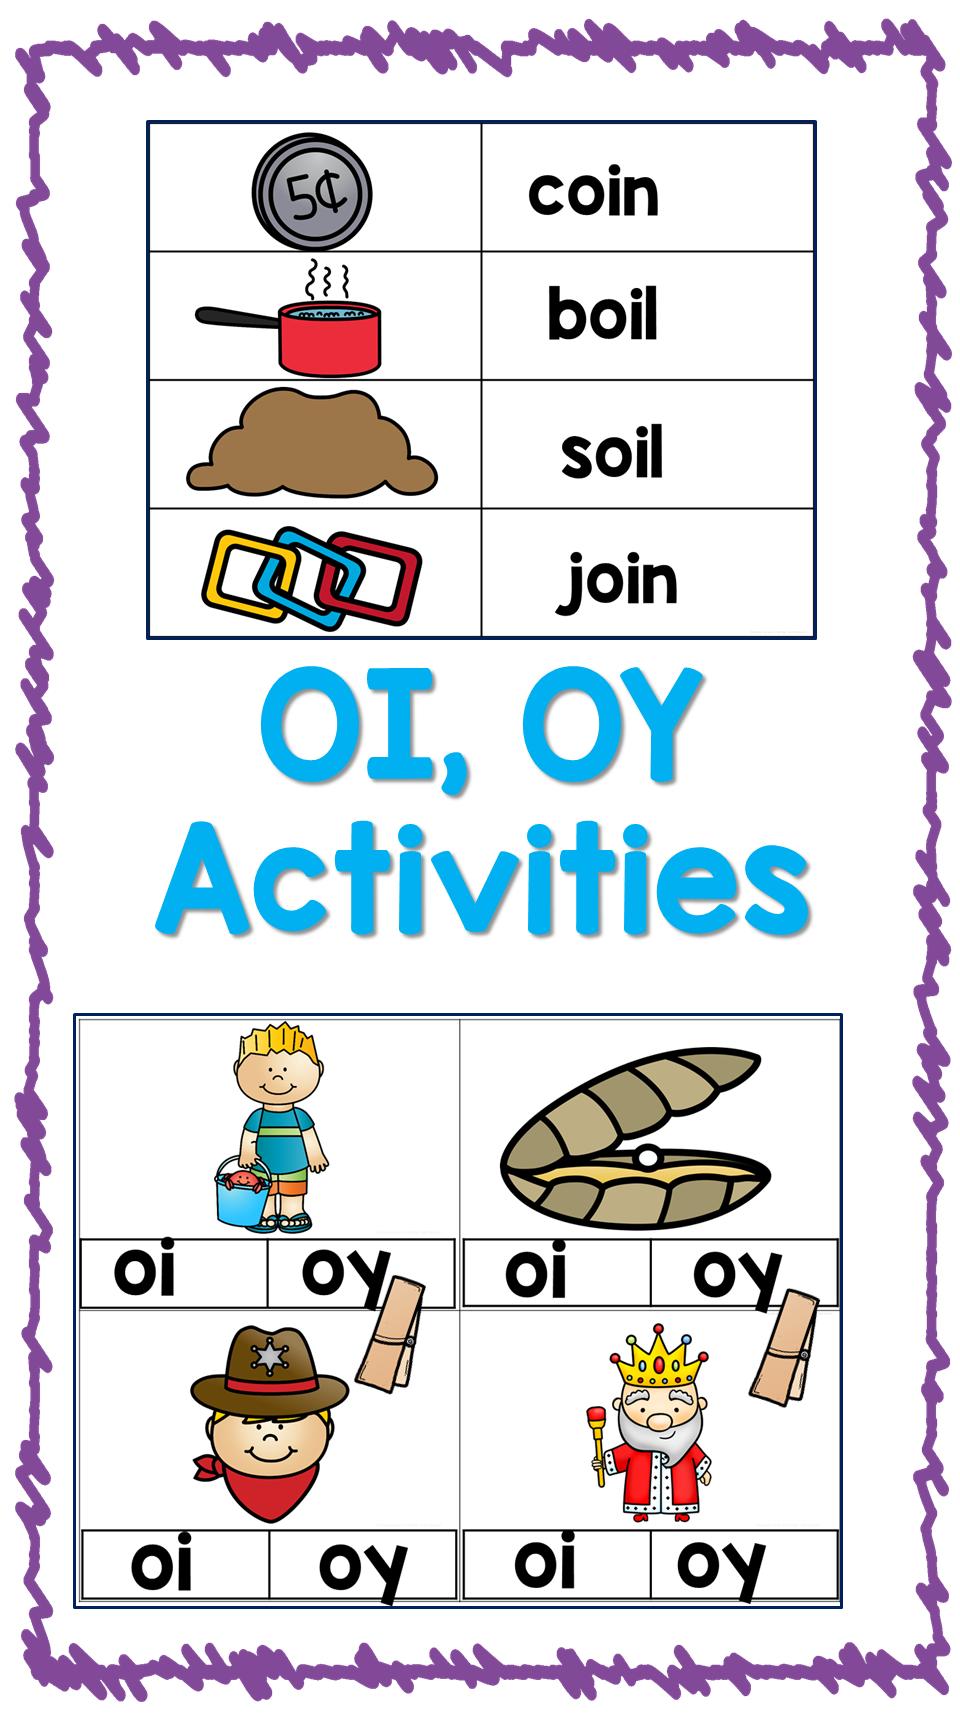 Workbooks » Oy Sound Worksheets - Free Printable Worksheets for Pre ...